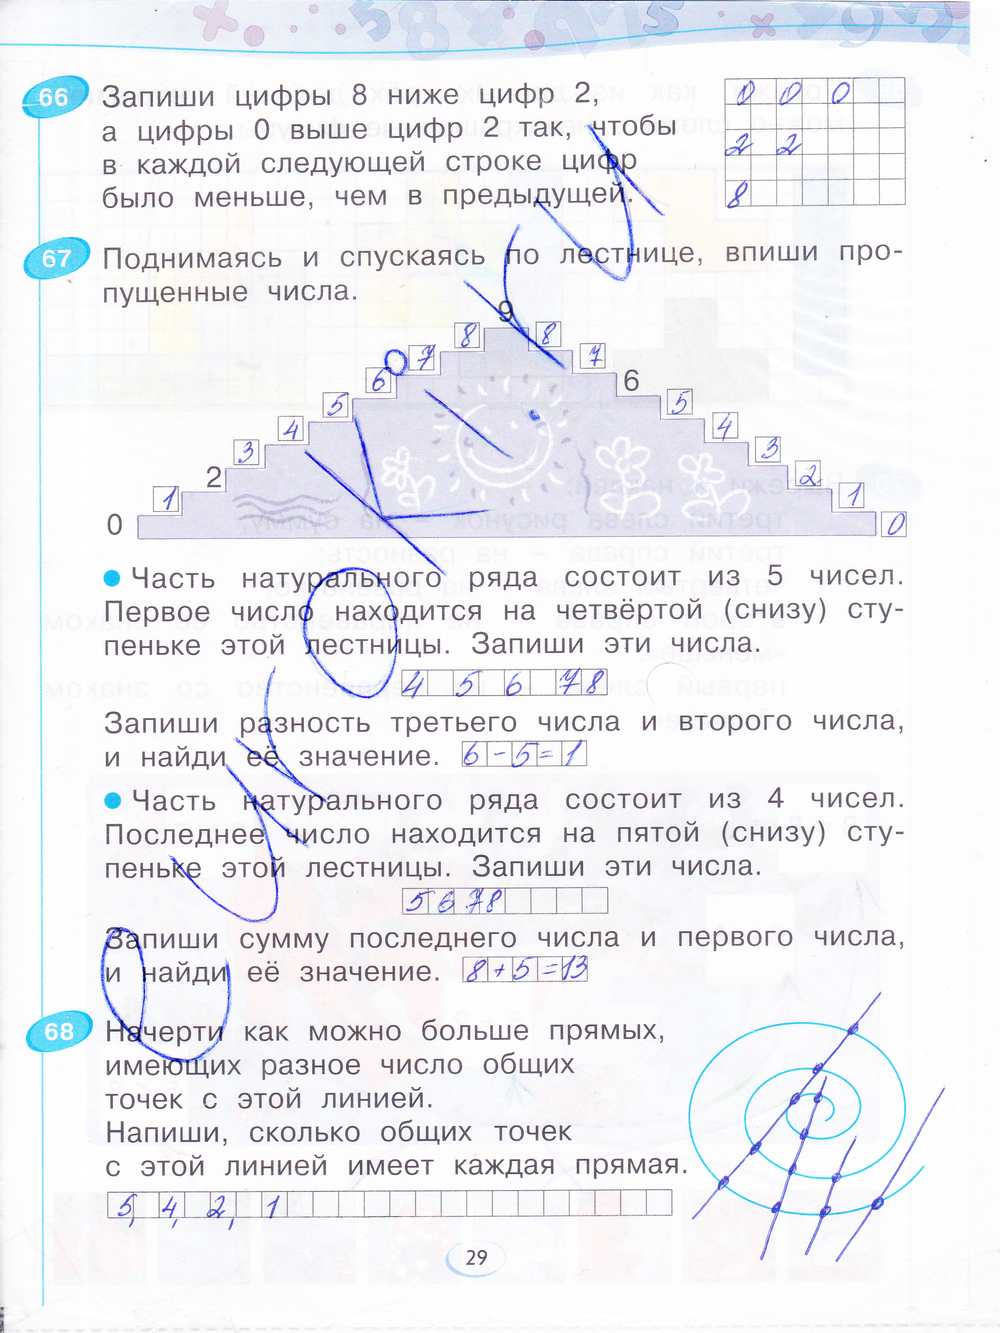 Гдз По Математике 3 Класс Бененсон Итина Рабочая Тетрадь 3